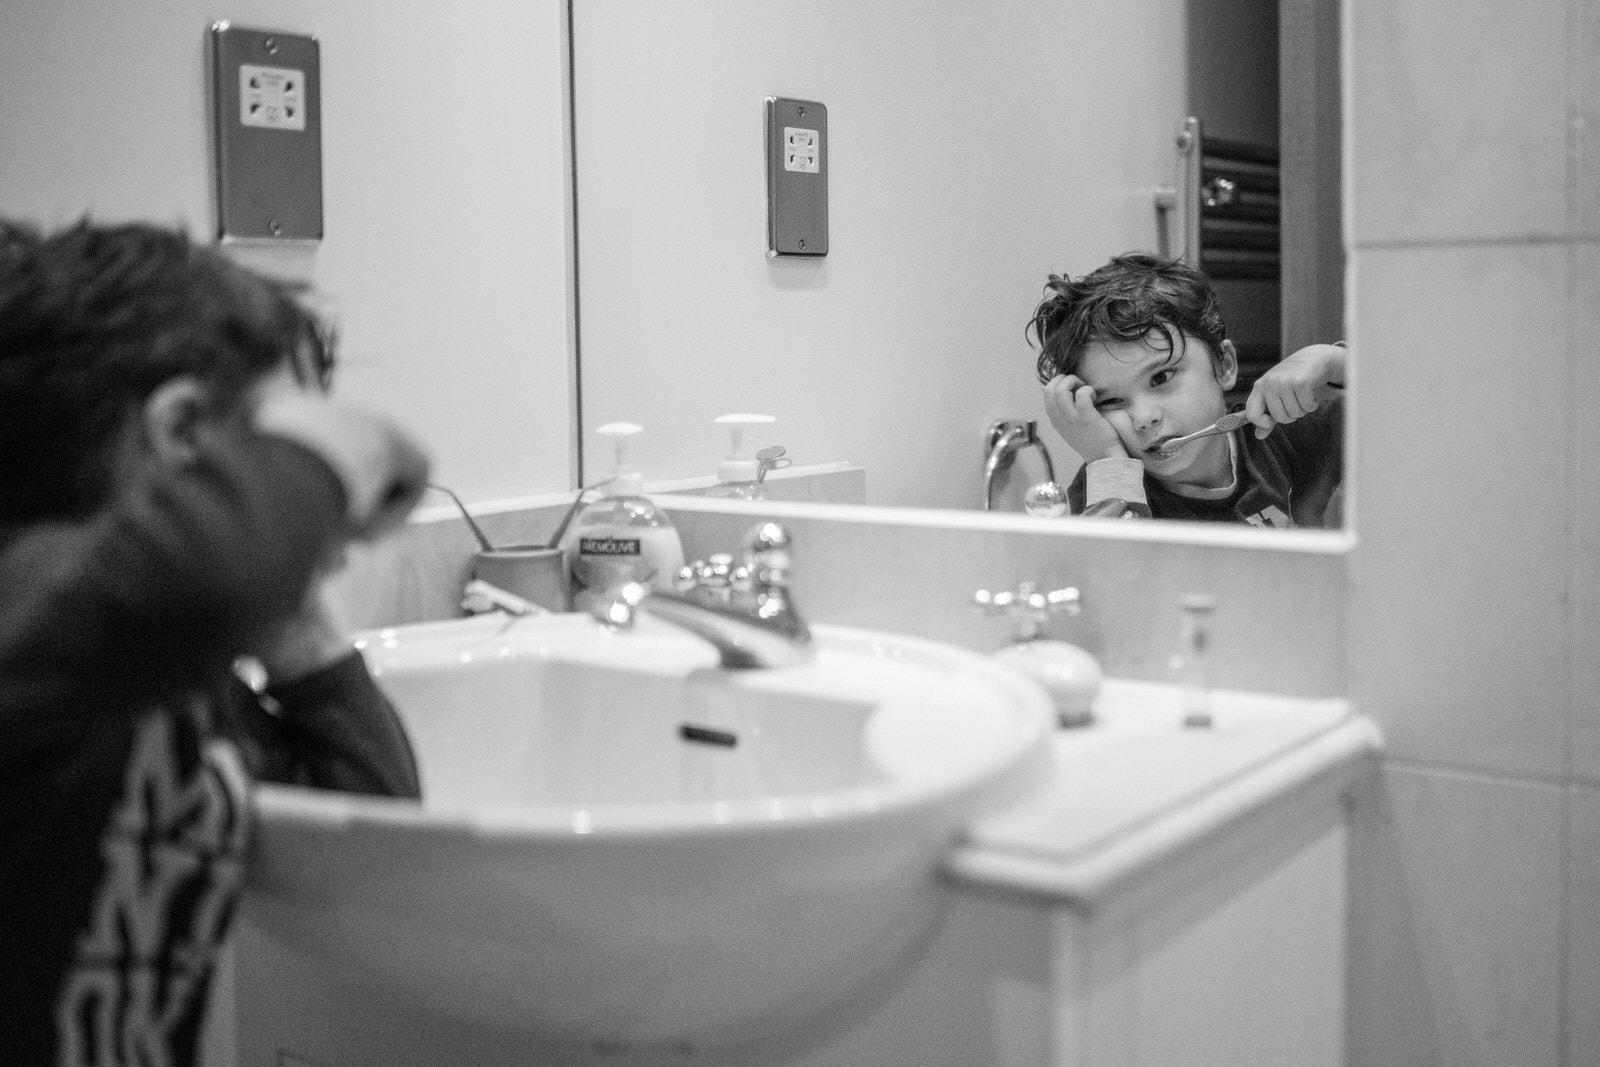 kensington-day-in-the-life-documentary-family-photographs-0196